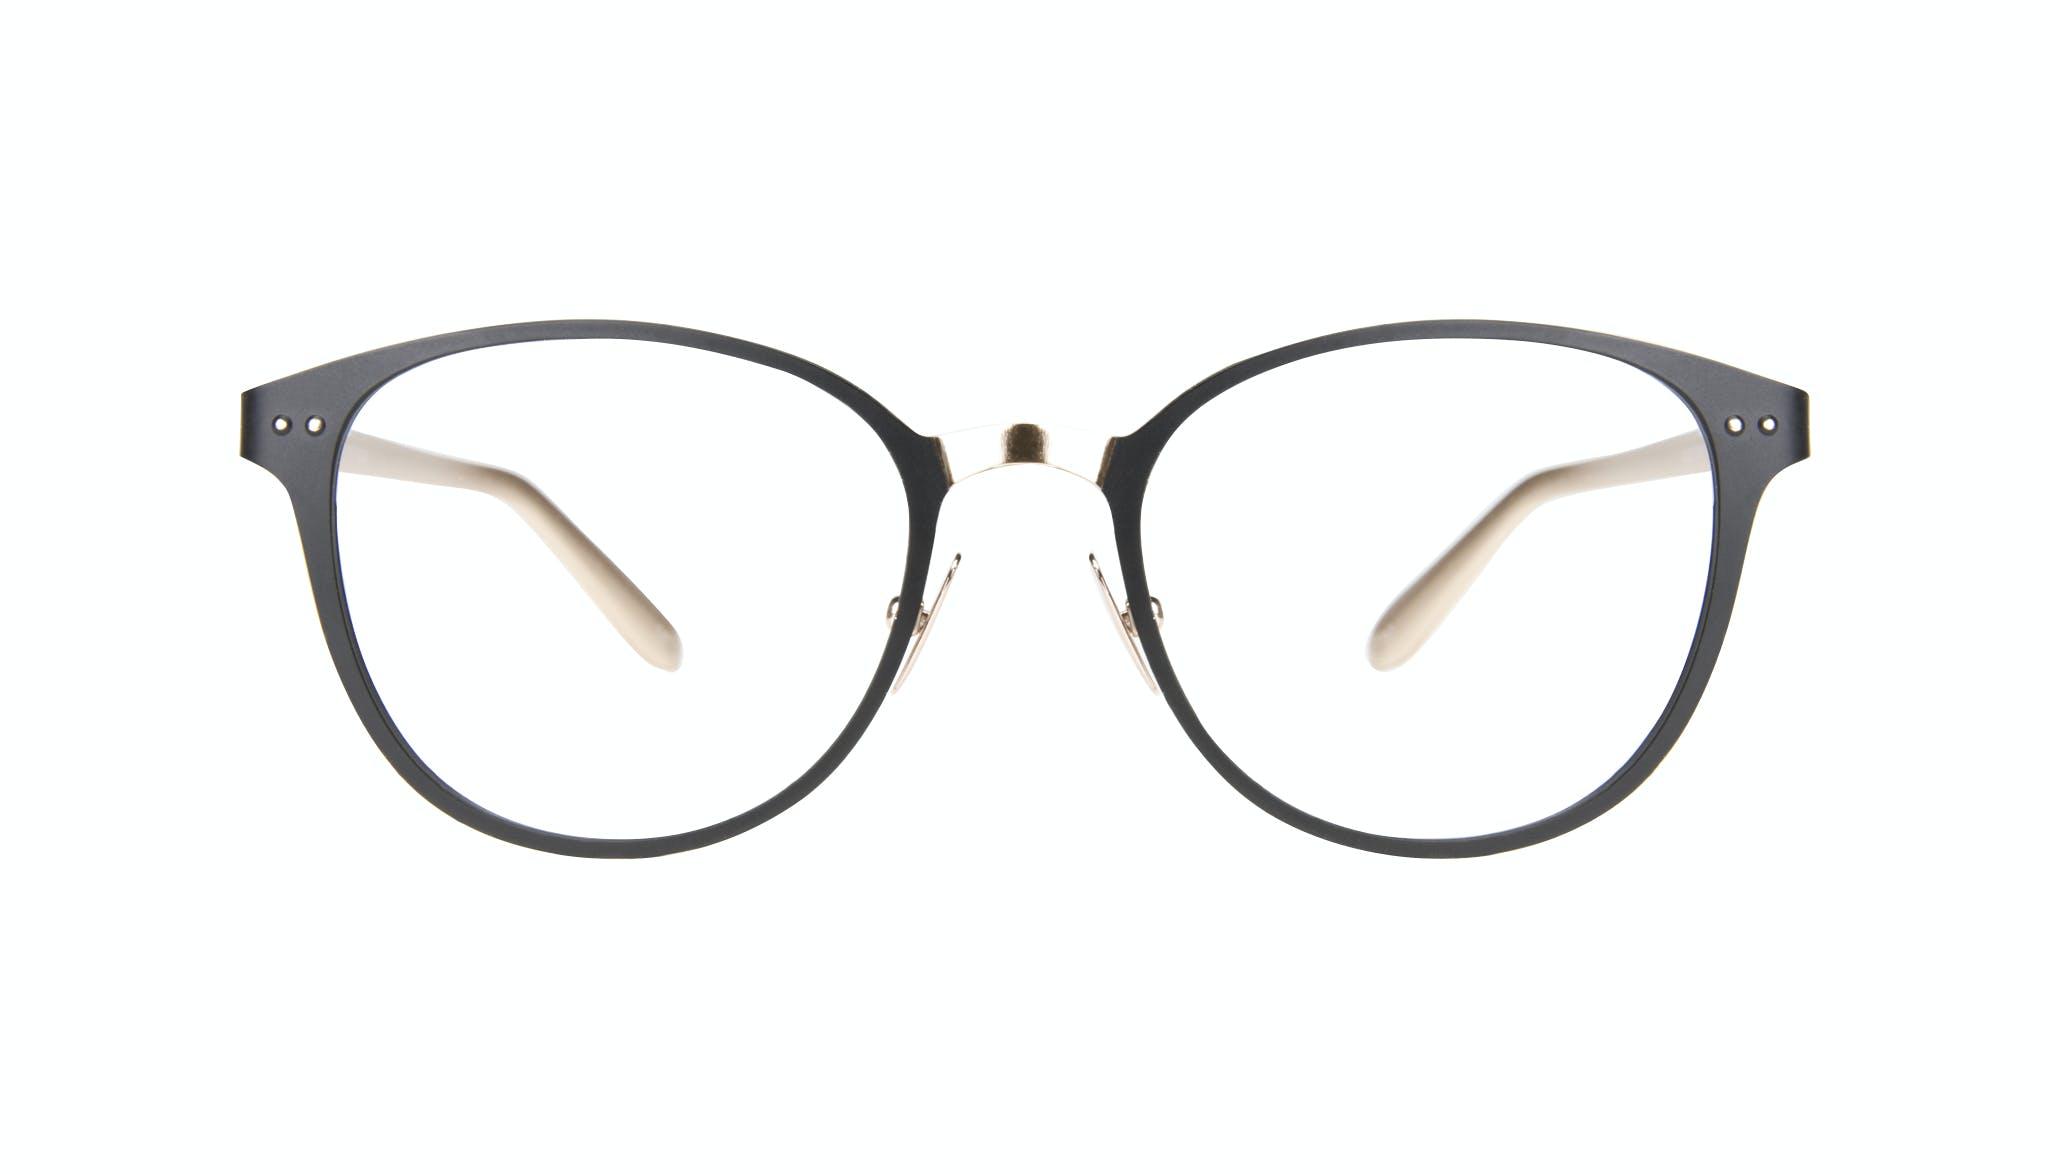 Affordable Fashion Glasses Rectangle Eyeglasses Women Kind Deep Gold